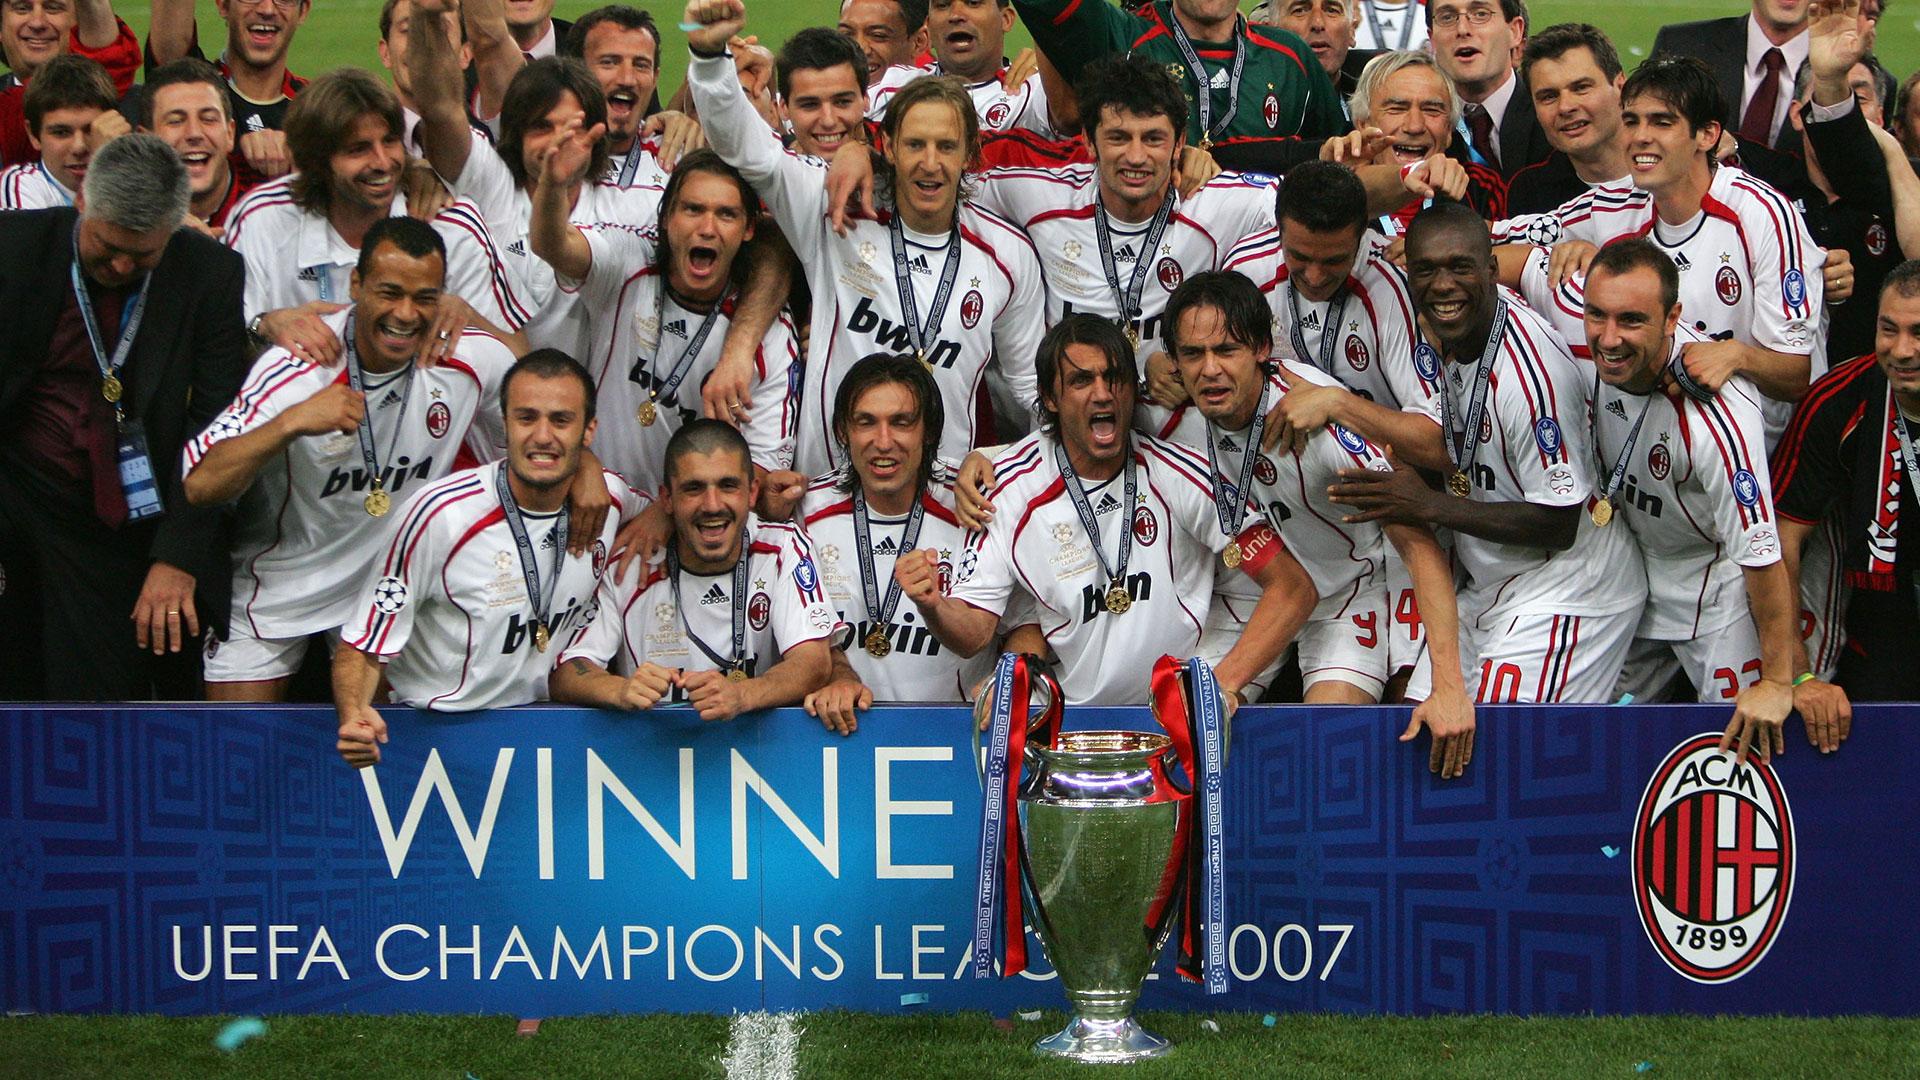 finale champions - photo #44